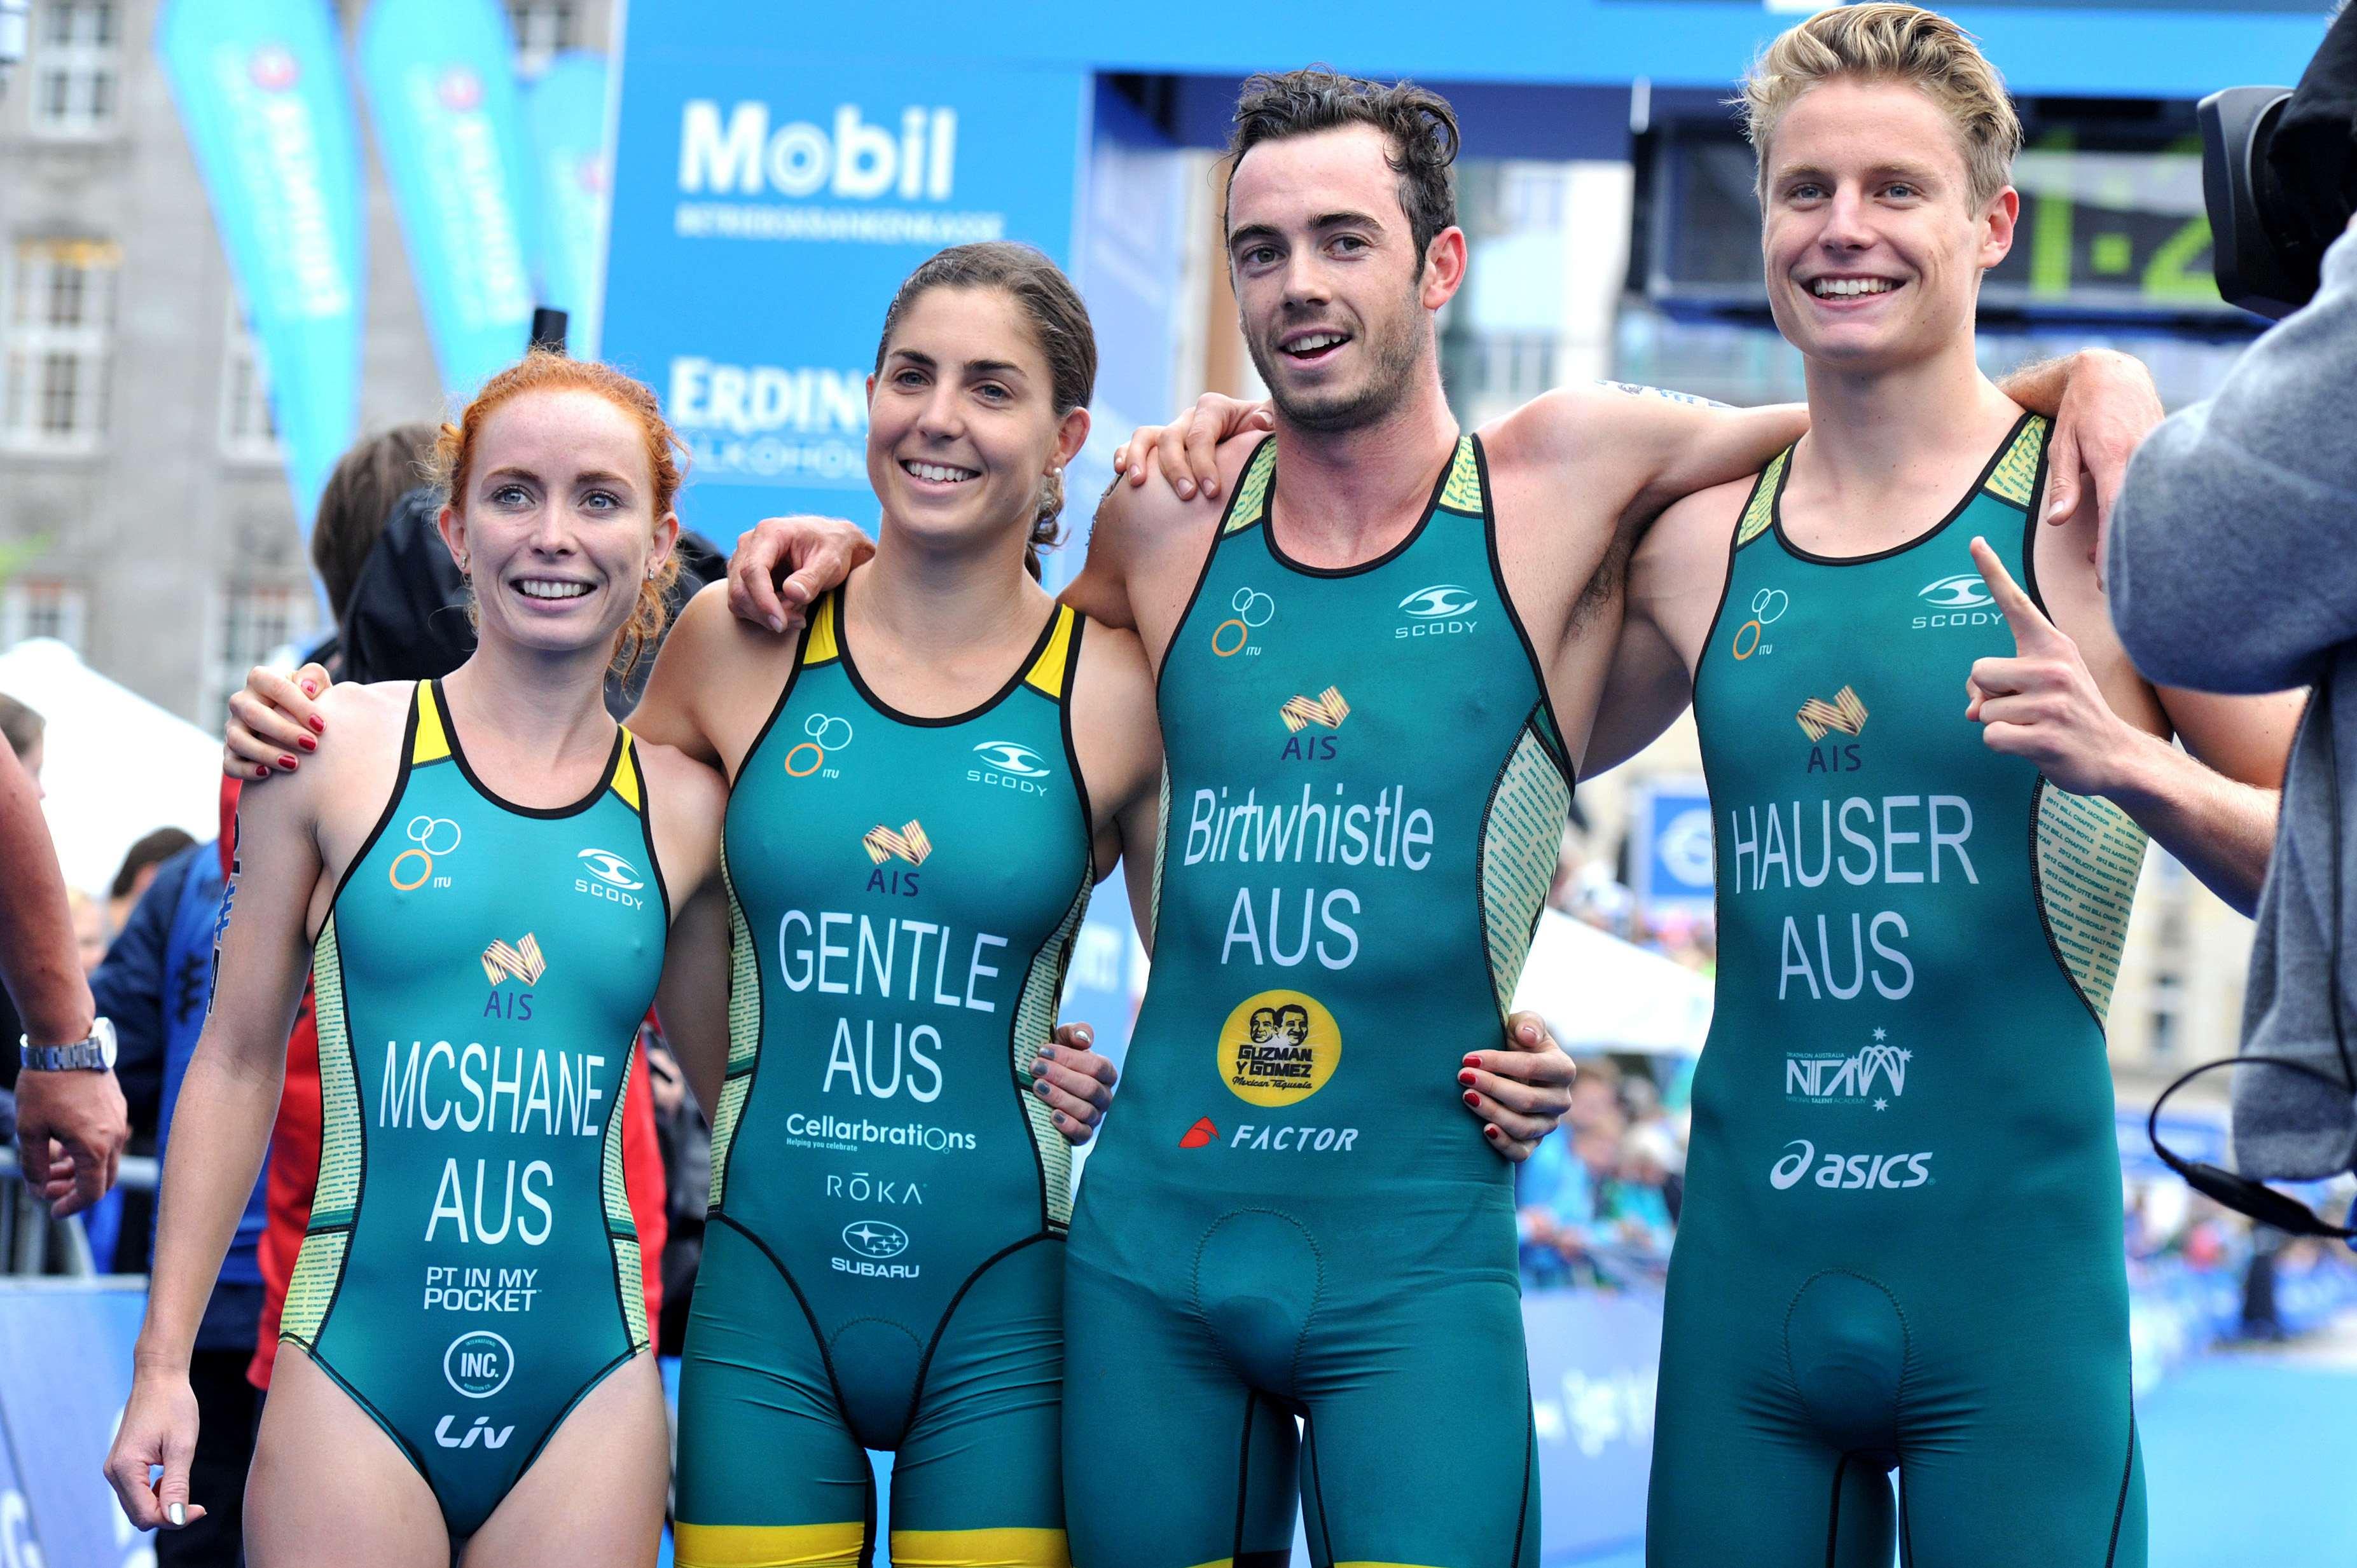 Triathlon Teams Relay World Championship in Hamburg